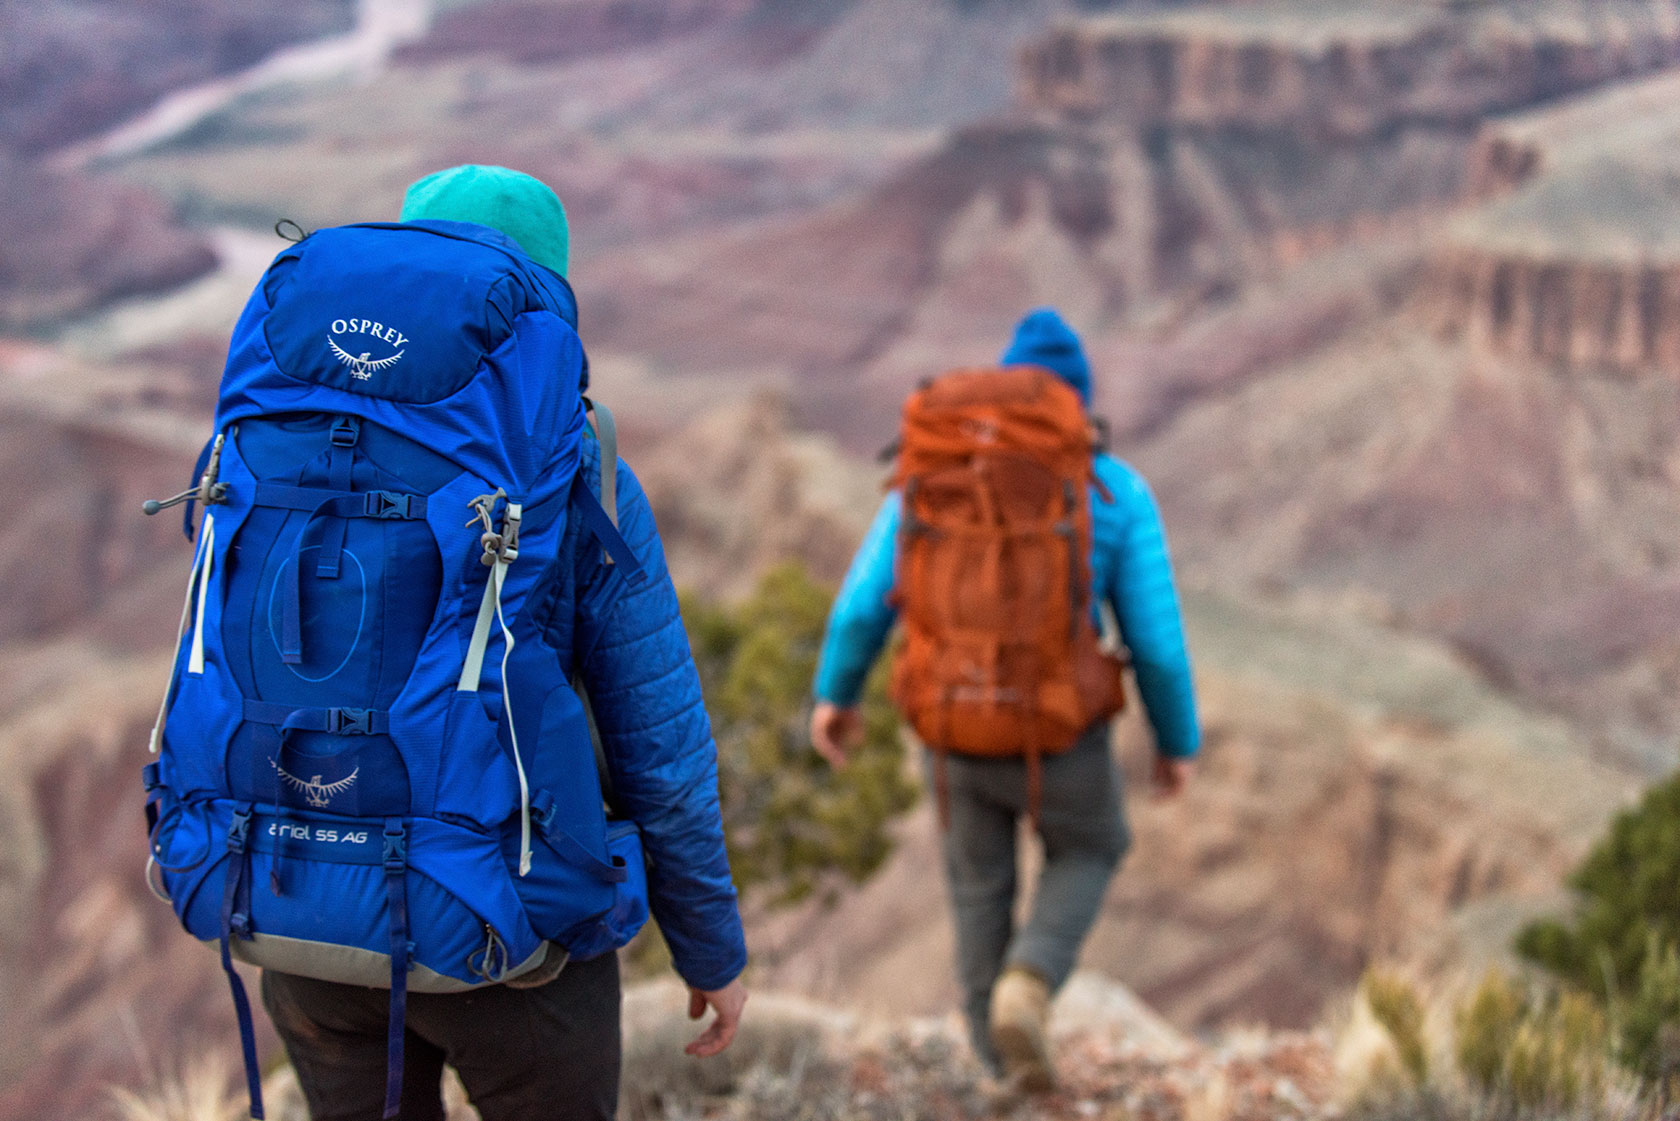 austin-trigg-osprey-hiking-backpacks-grand-canyon-osprey-pack-bag-arizona-hike-camp-river-lifestyle-adventure-desert.jpg